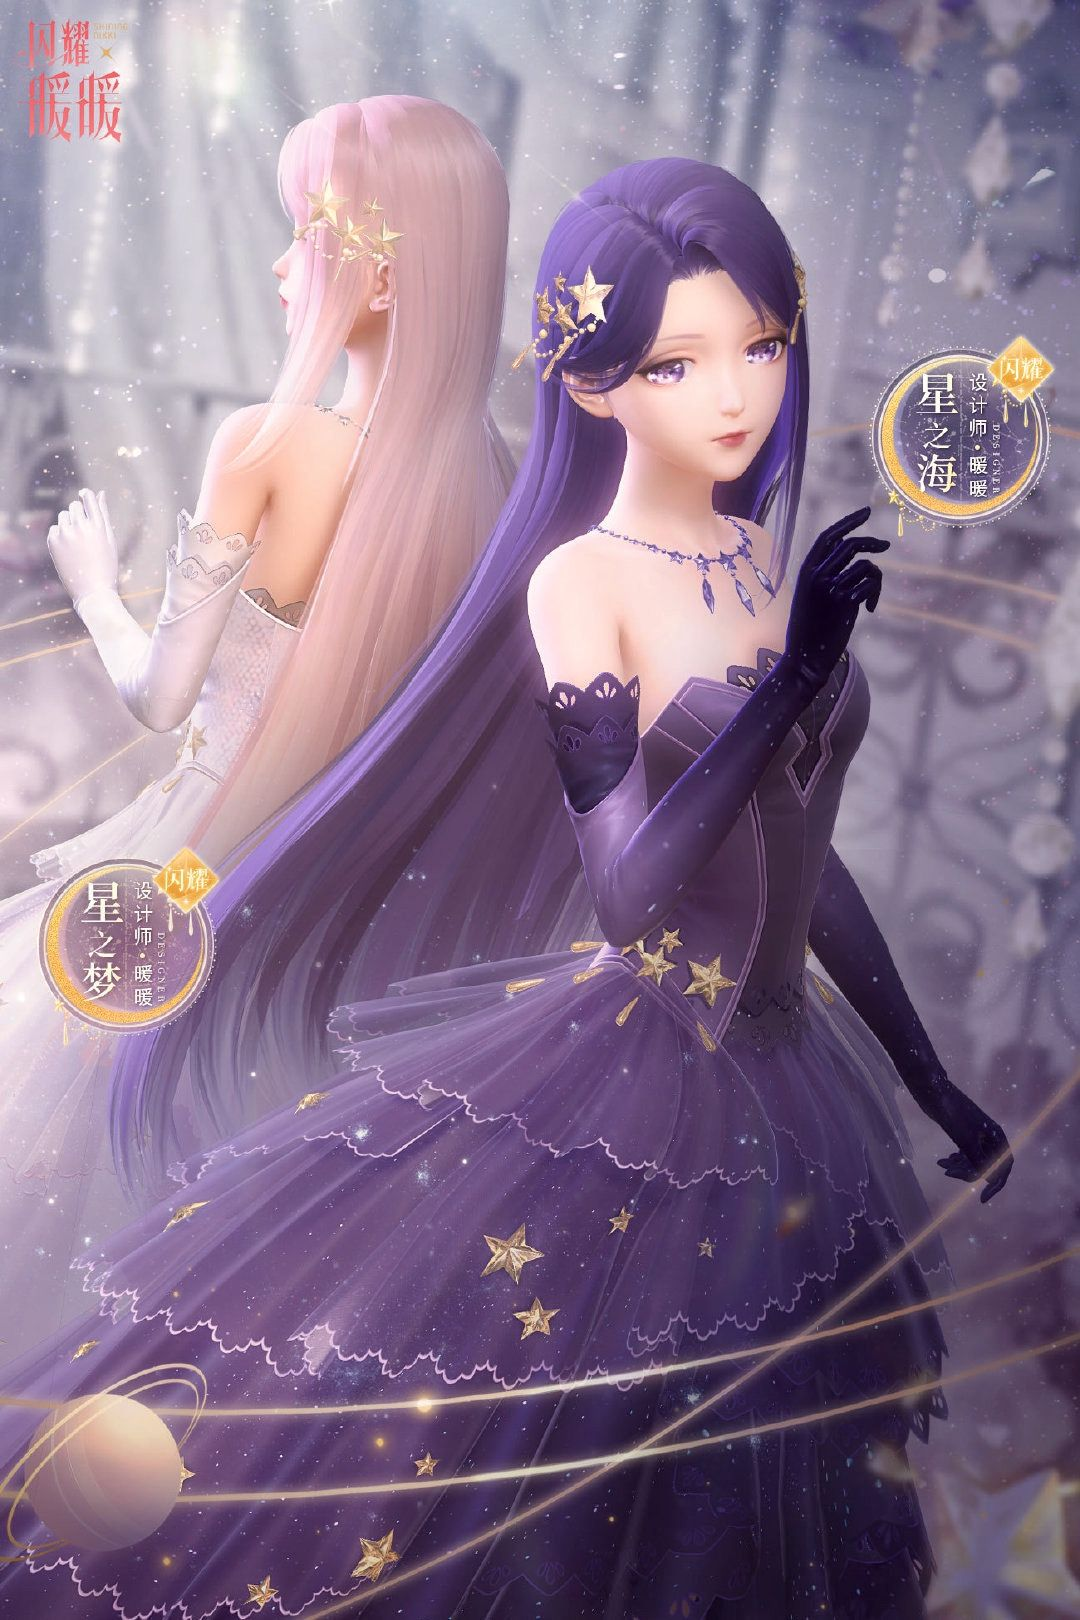 Shining Nikki 闪耀暖暖 / Star Sea Design (06/2020